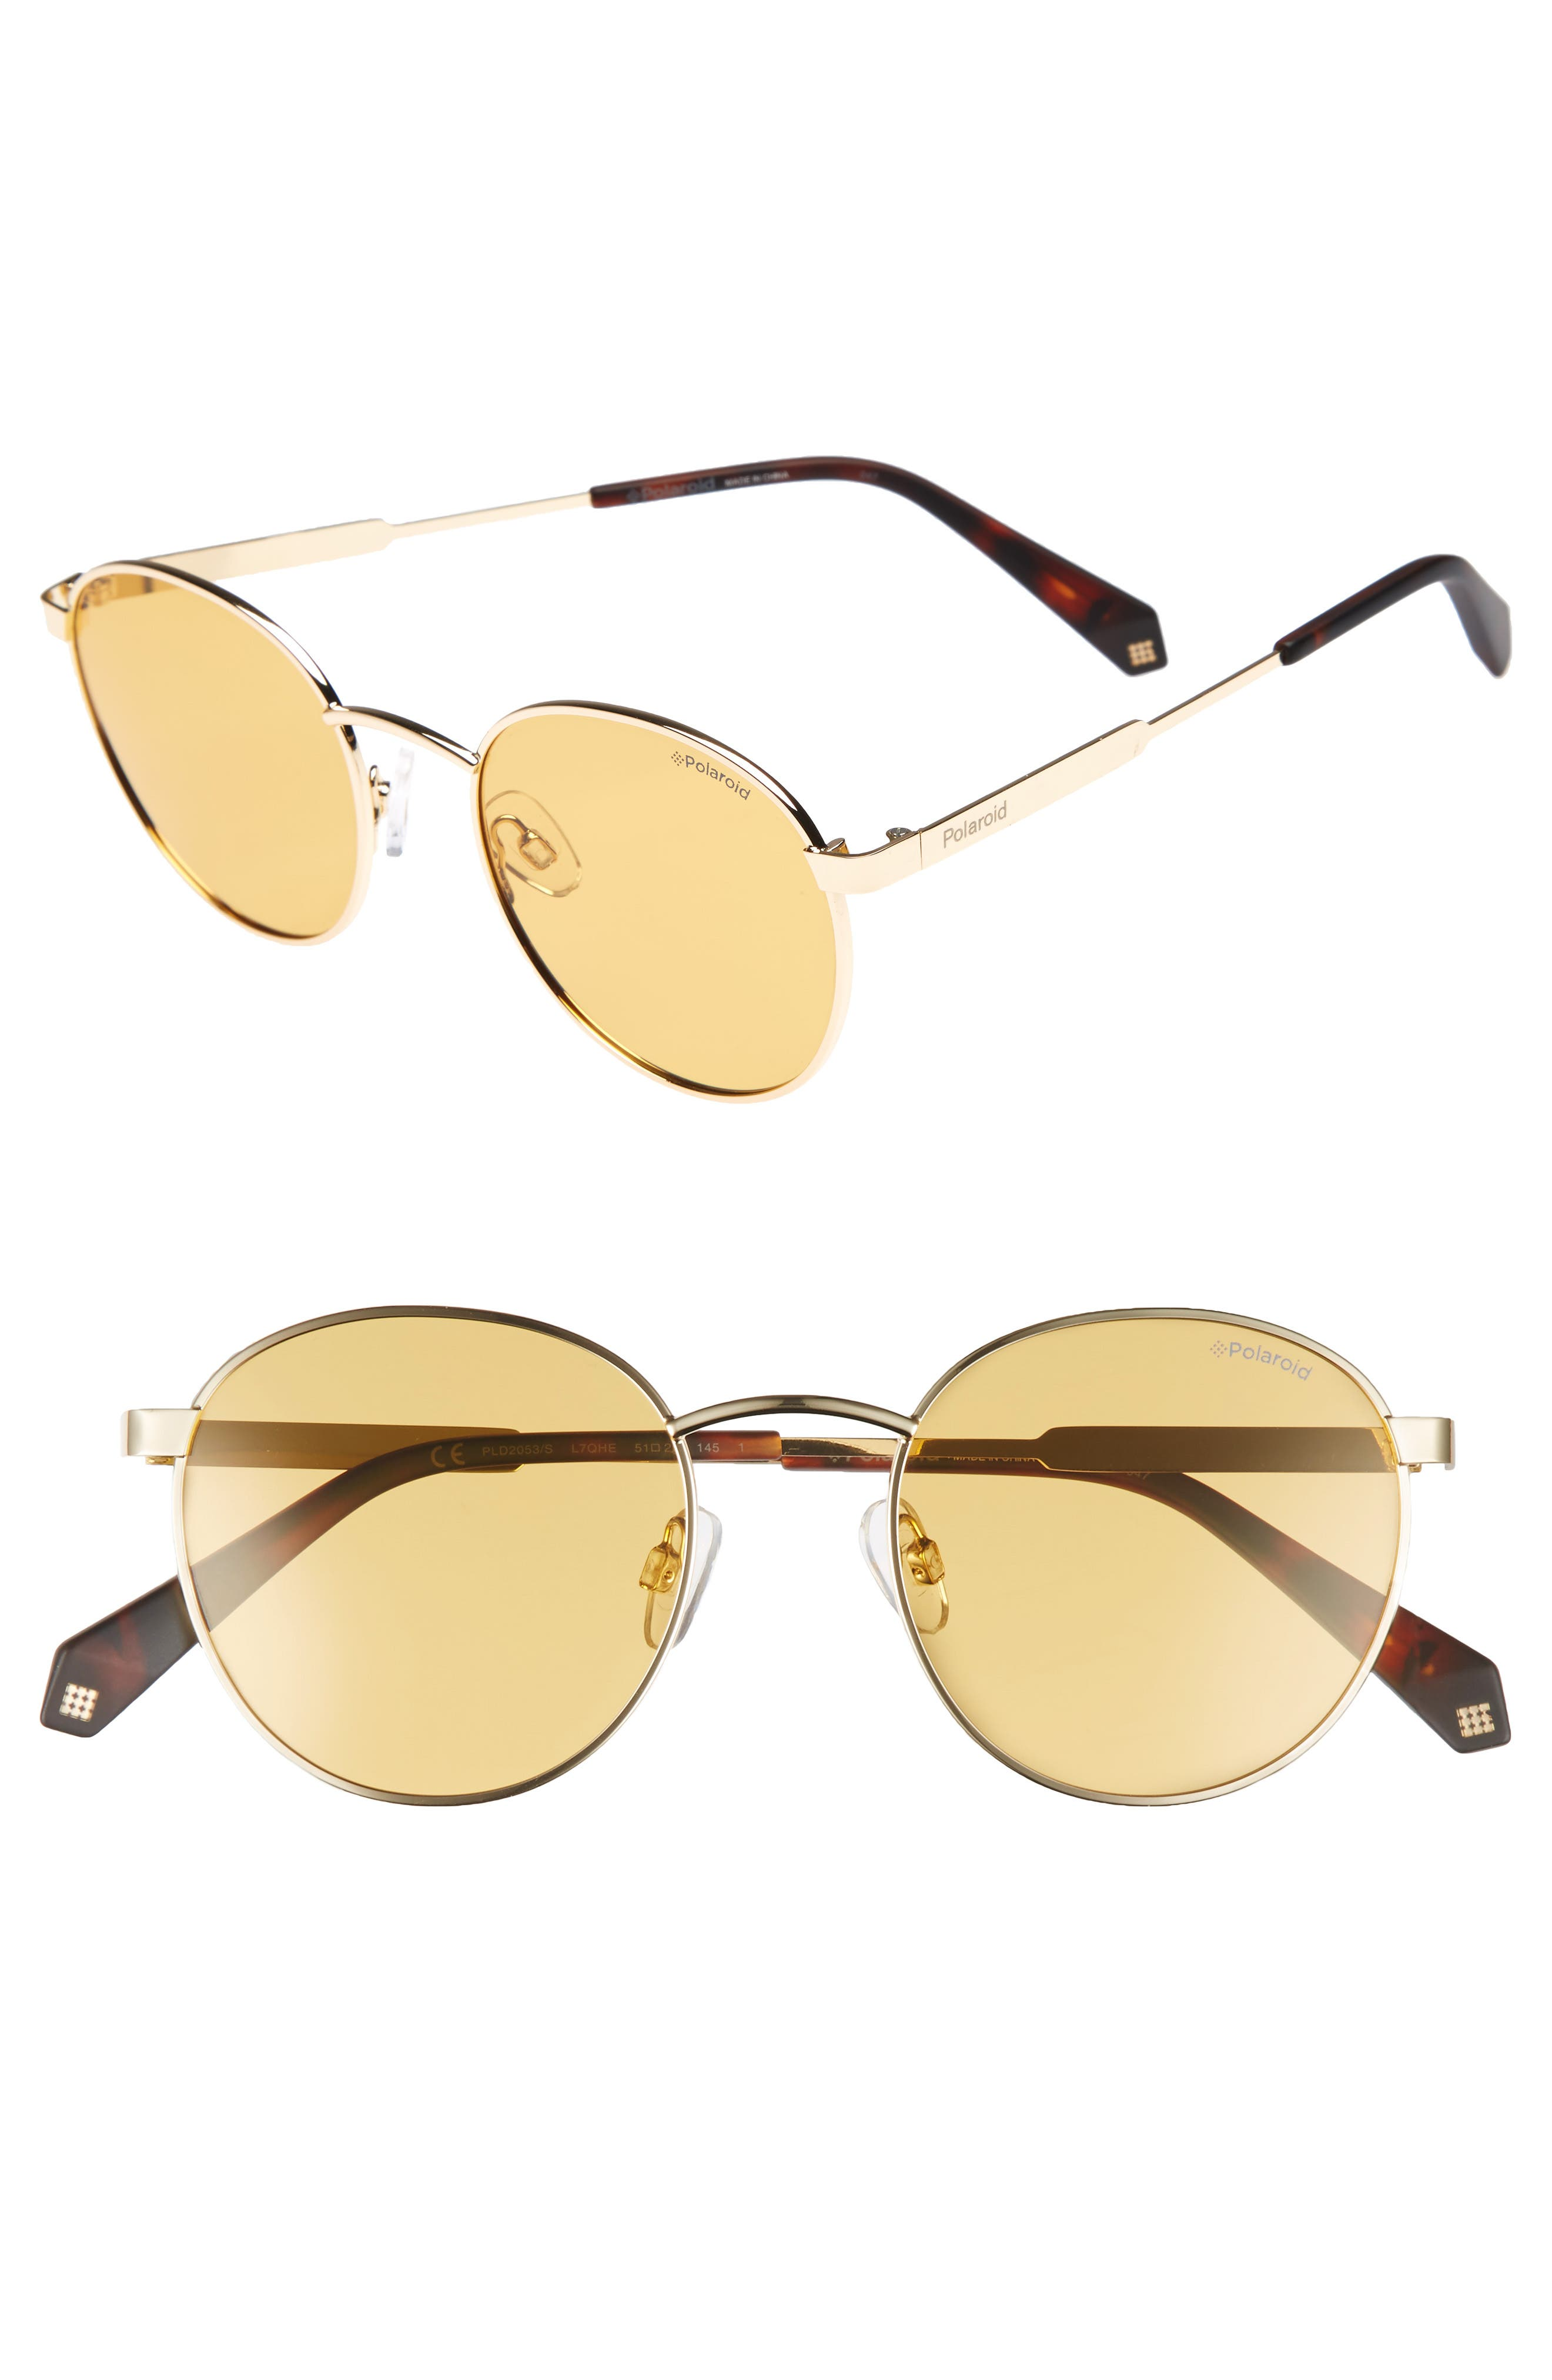 Polaroid 51mm Round Retro Polarized Sunglasses